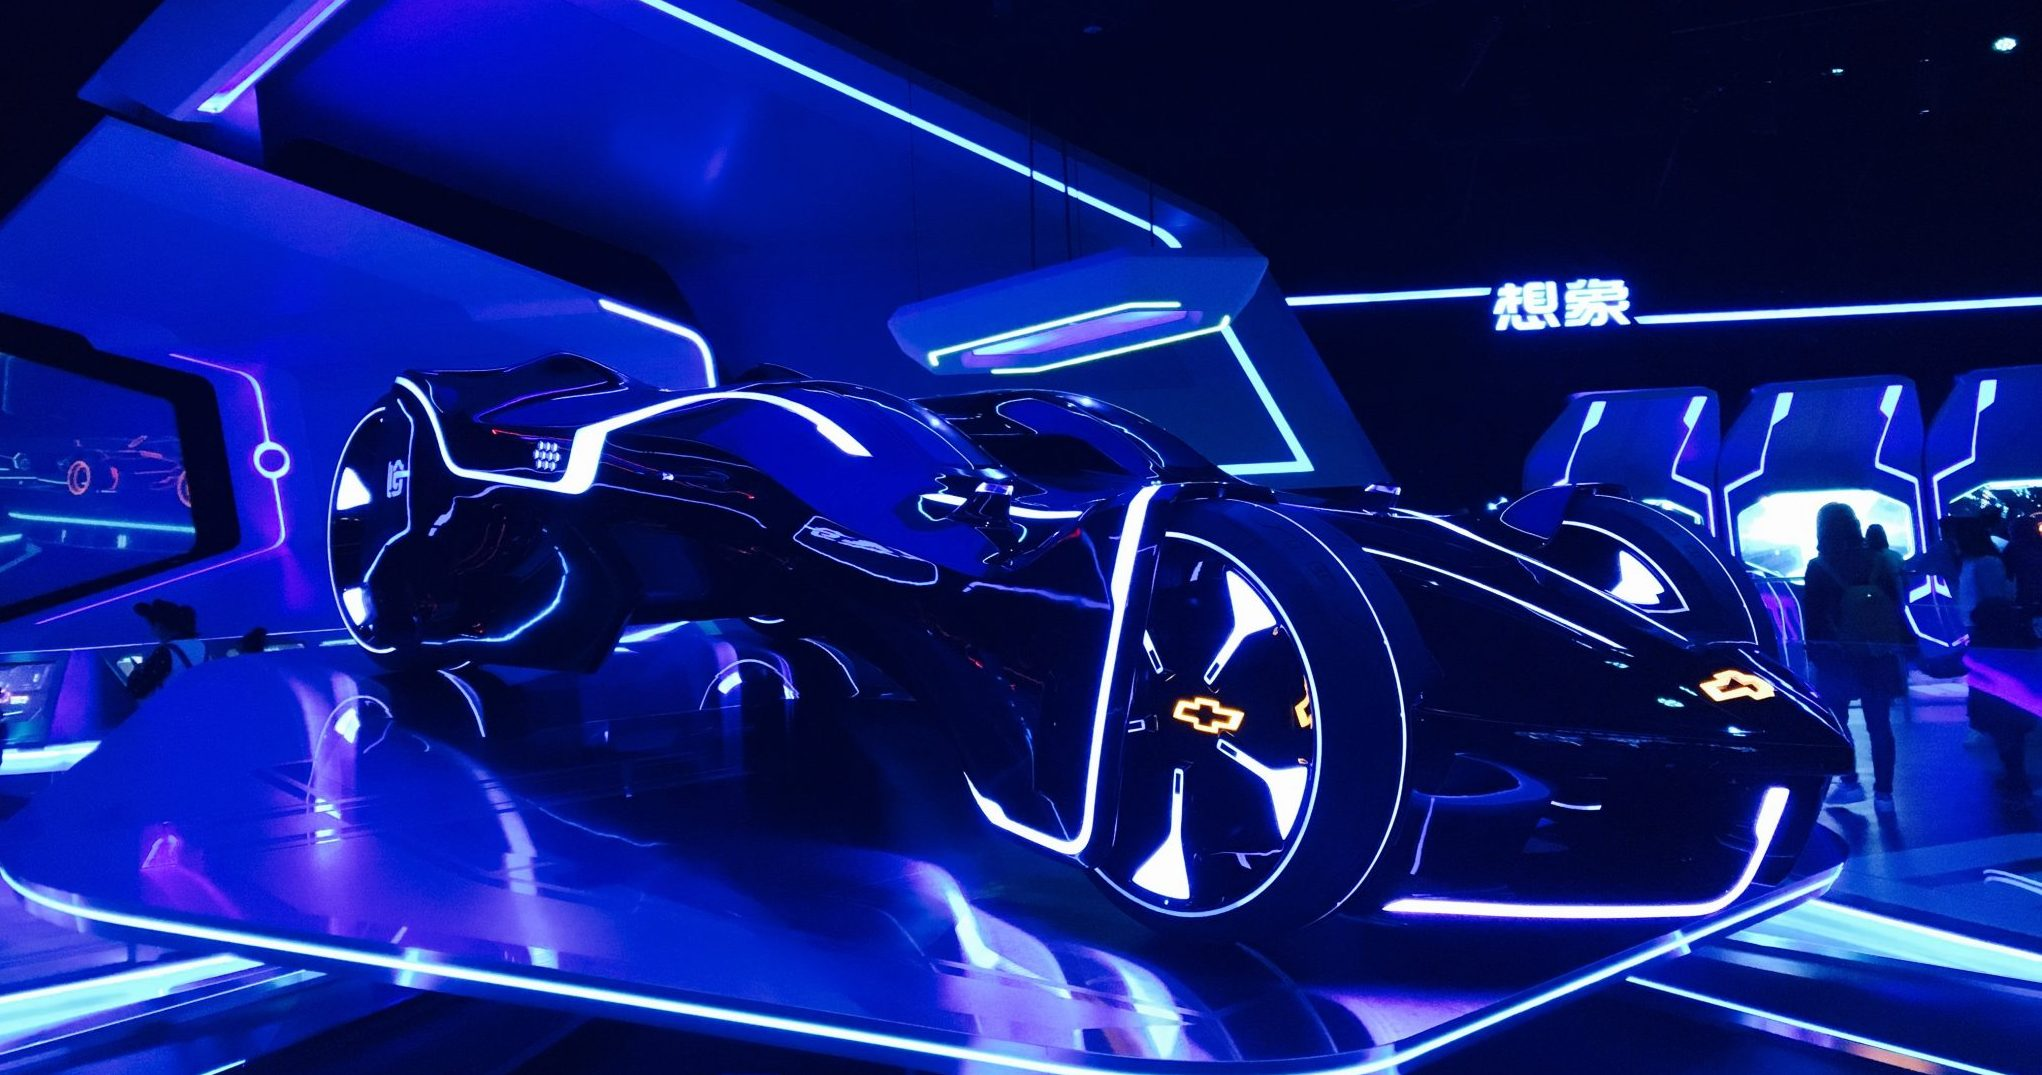 Future vehicle graphics